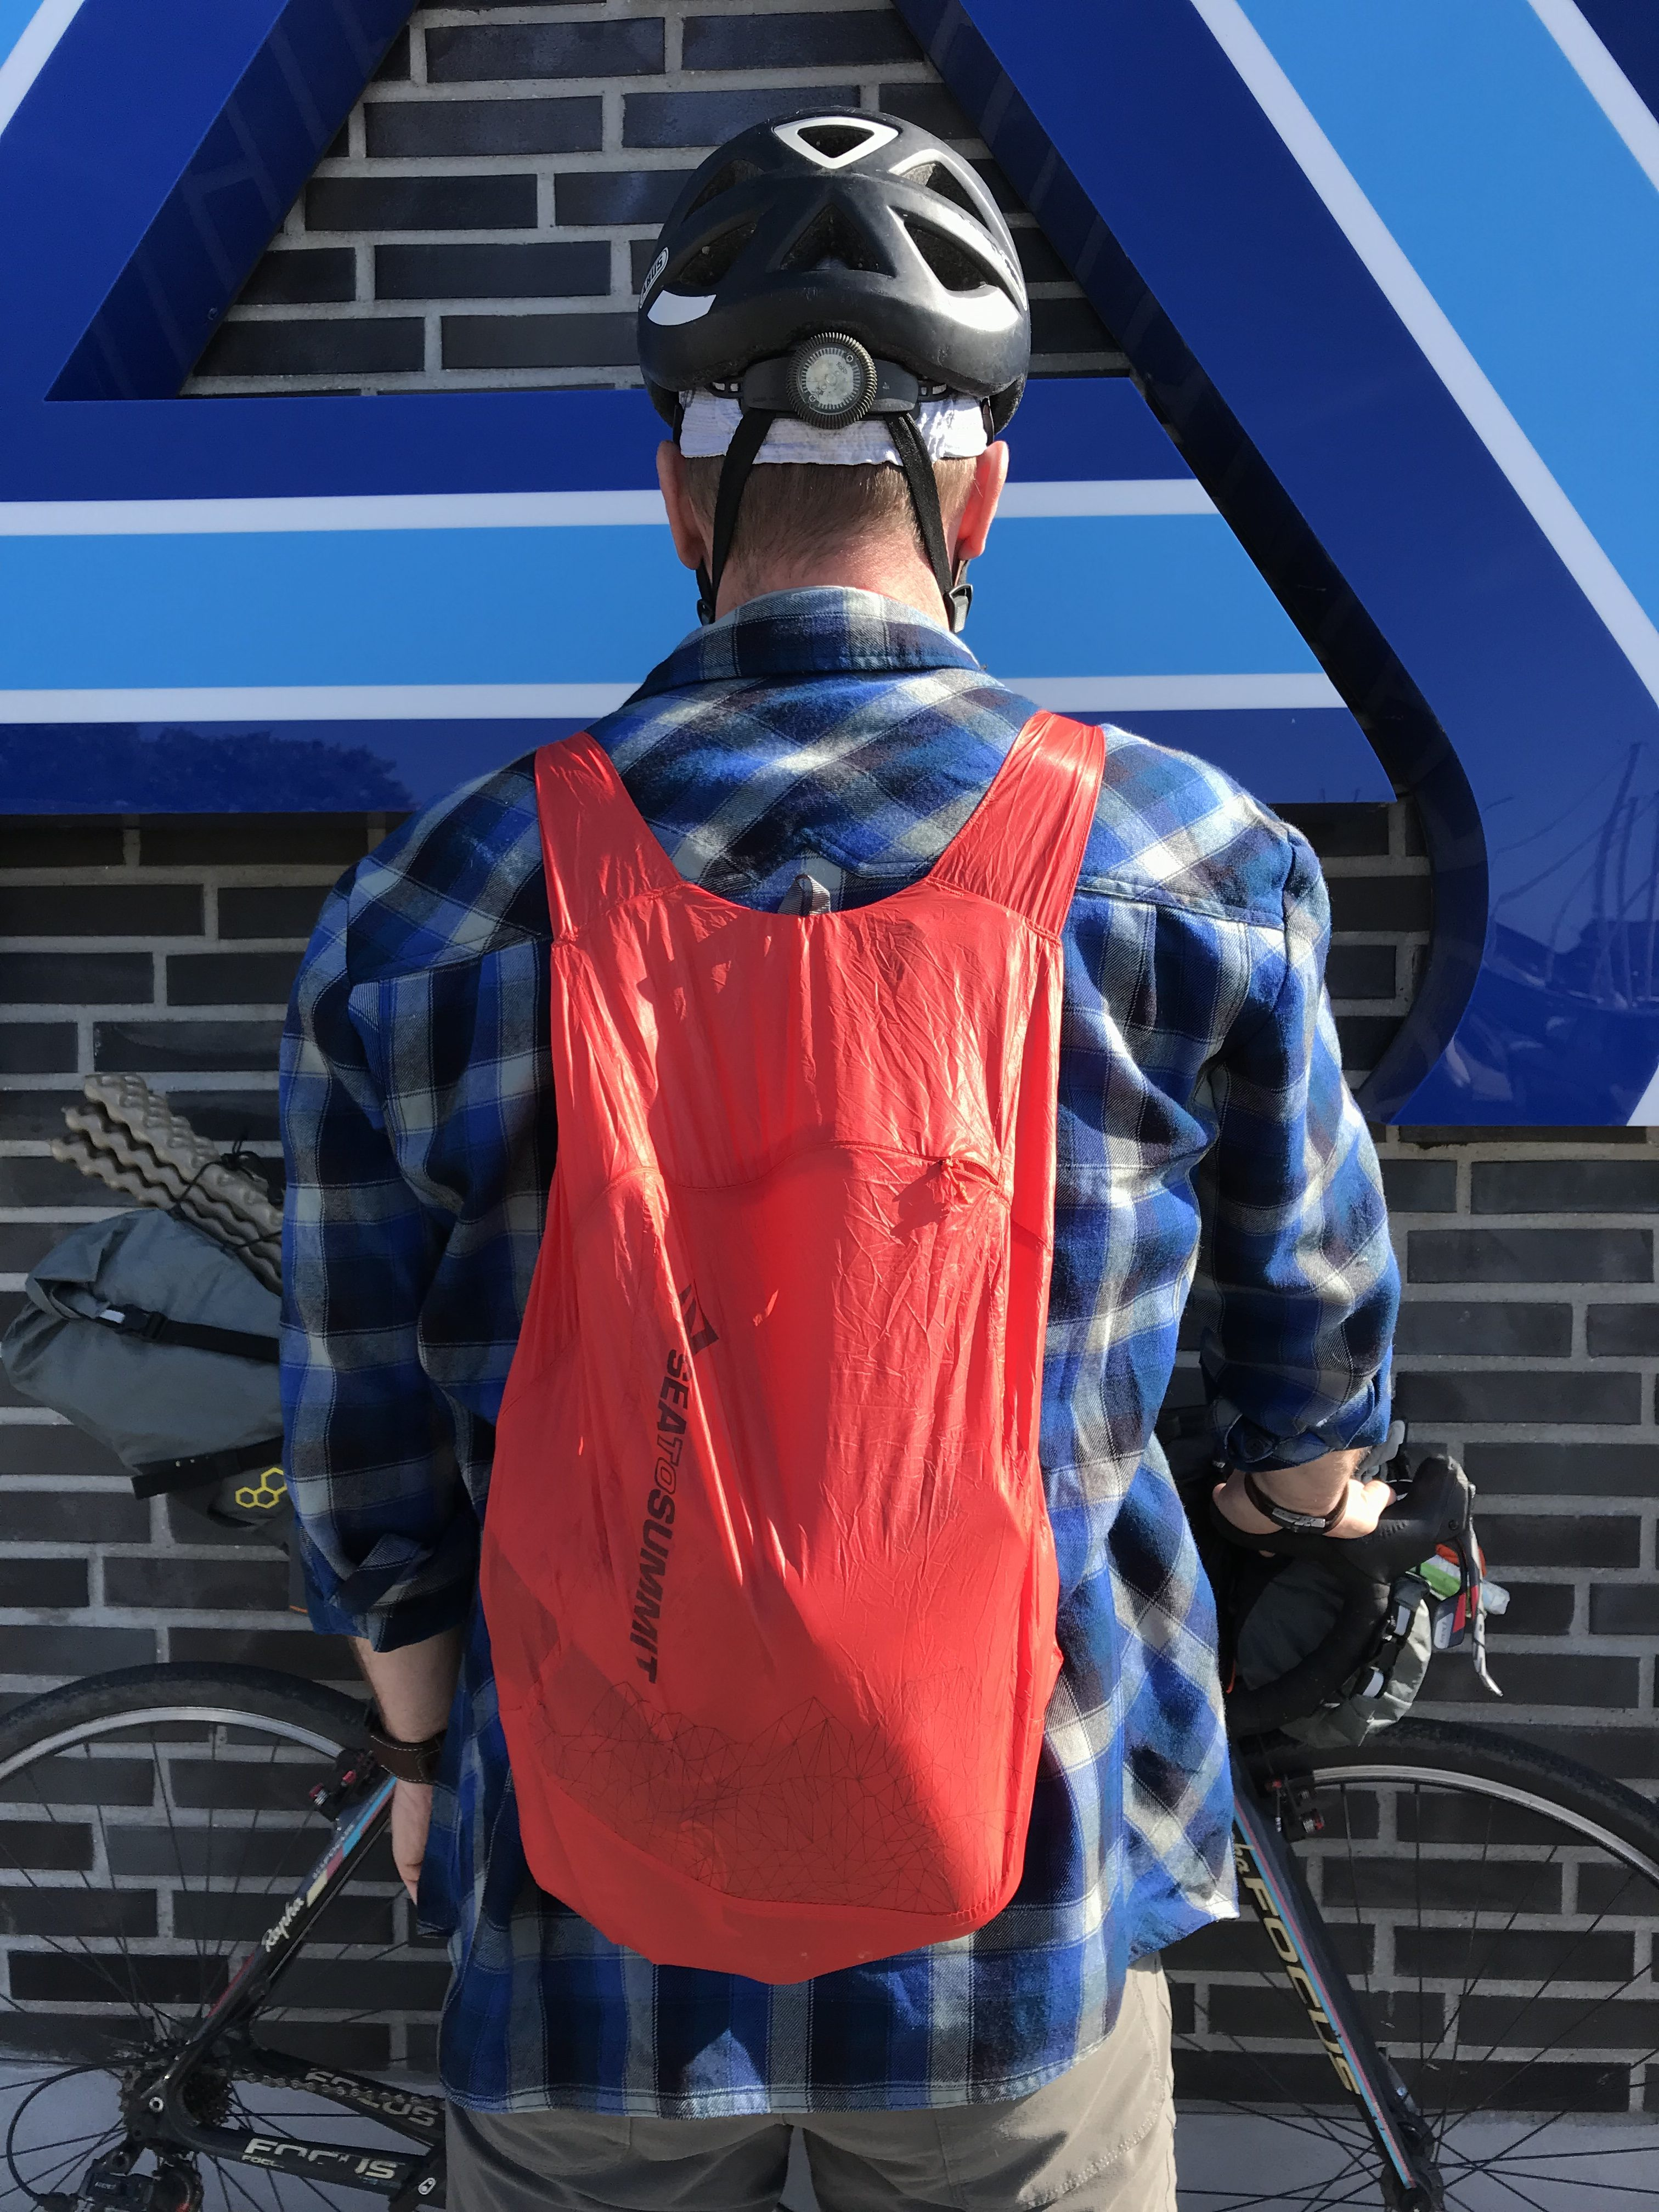 Sea To Summit Ultra-Sil Nano Daypack på ryggen efter fouragering i aldi på bikepacking tur i pinsen.